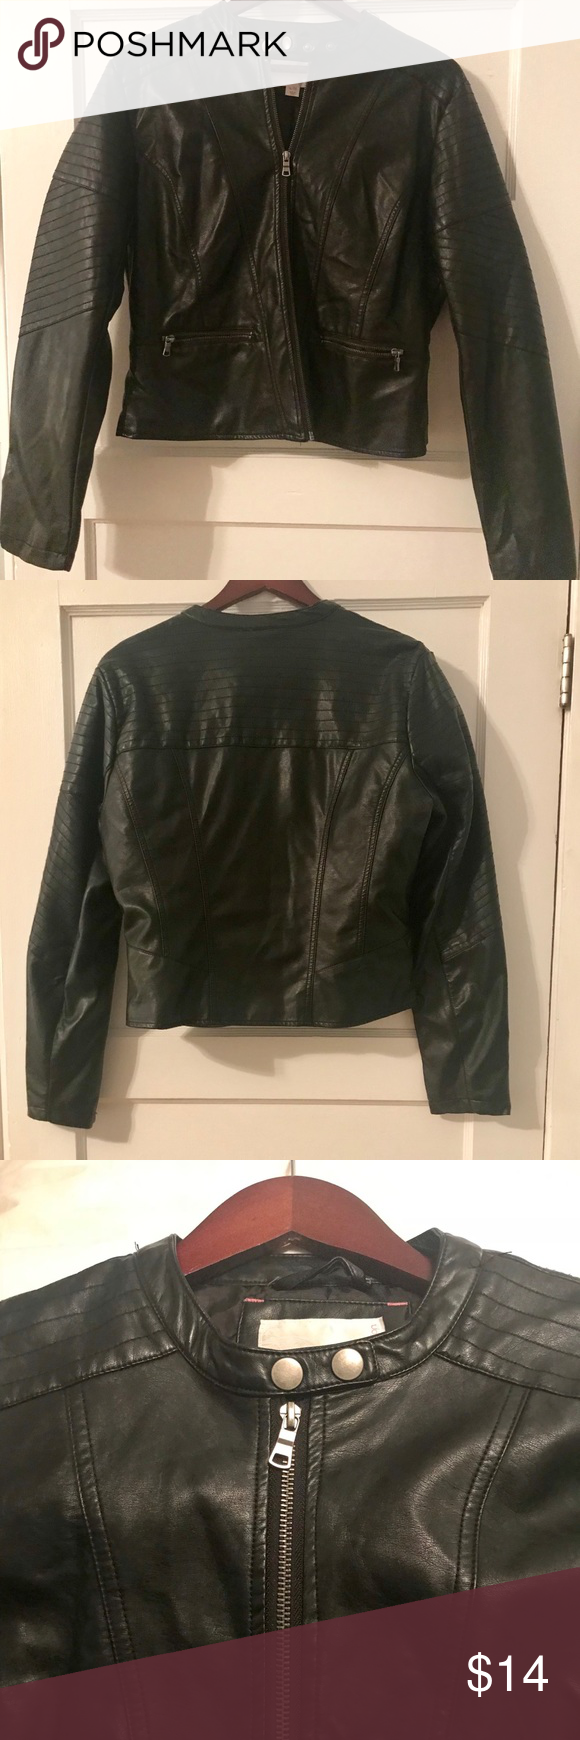 Bundle Save Black Faux Leather Jacket Black Faux Leather Jacket Leather Jacket Faux Leather Jackets [ png ]